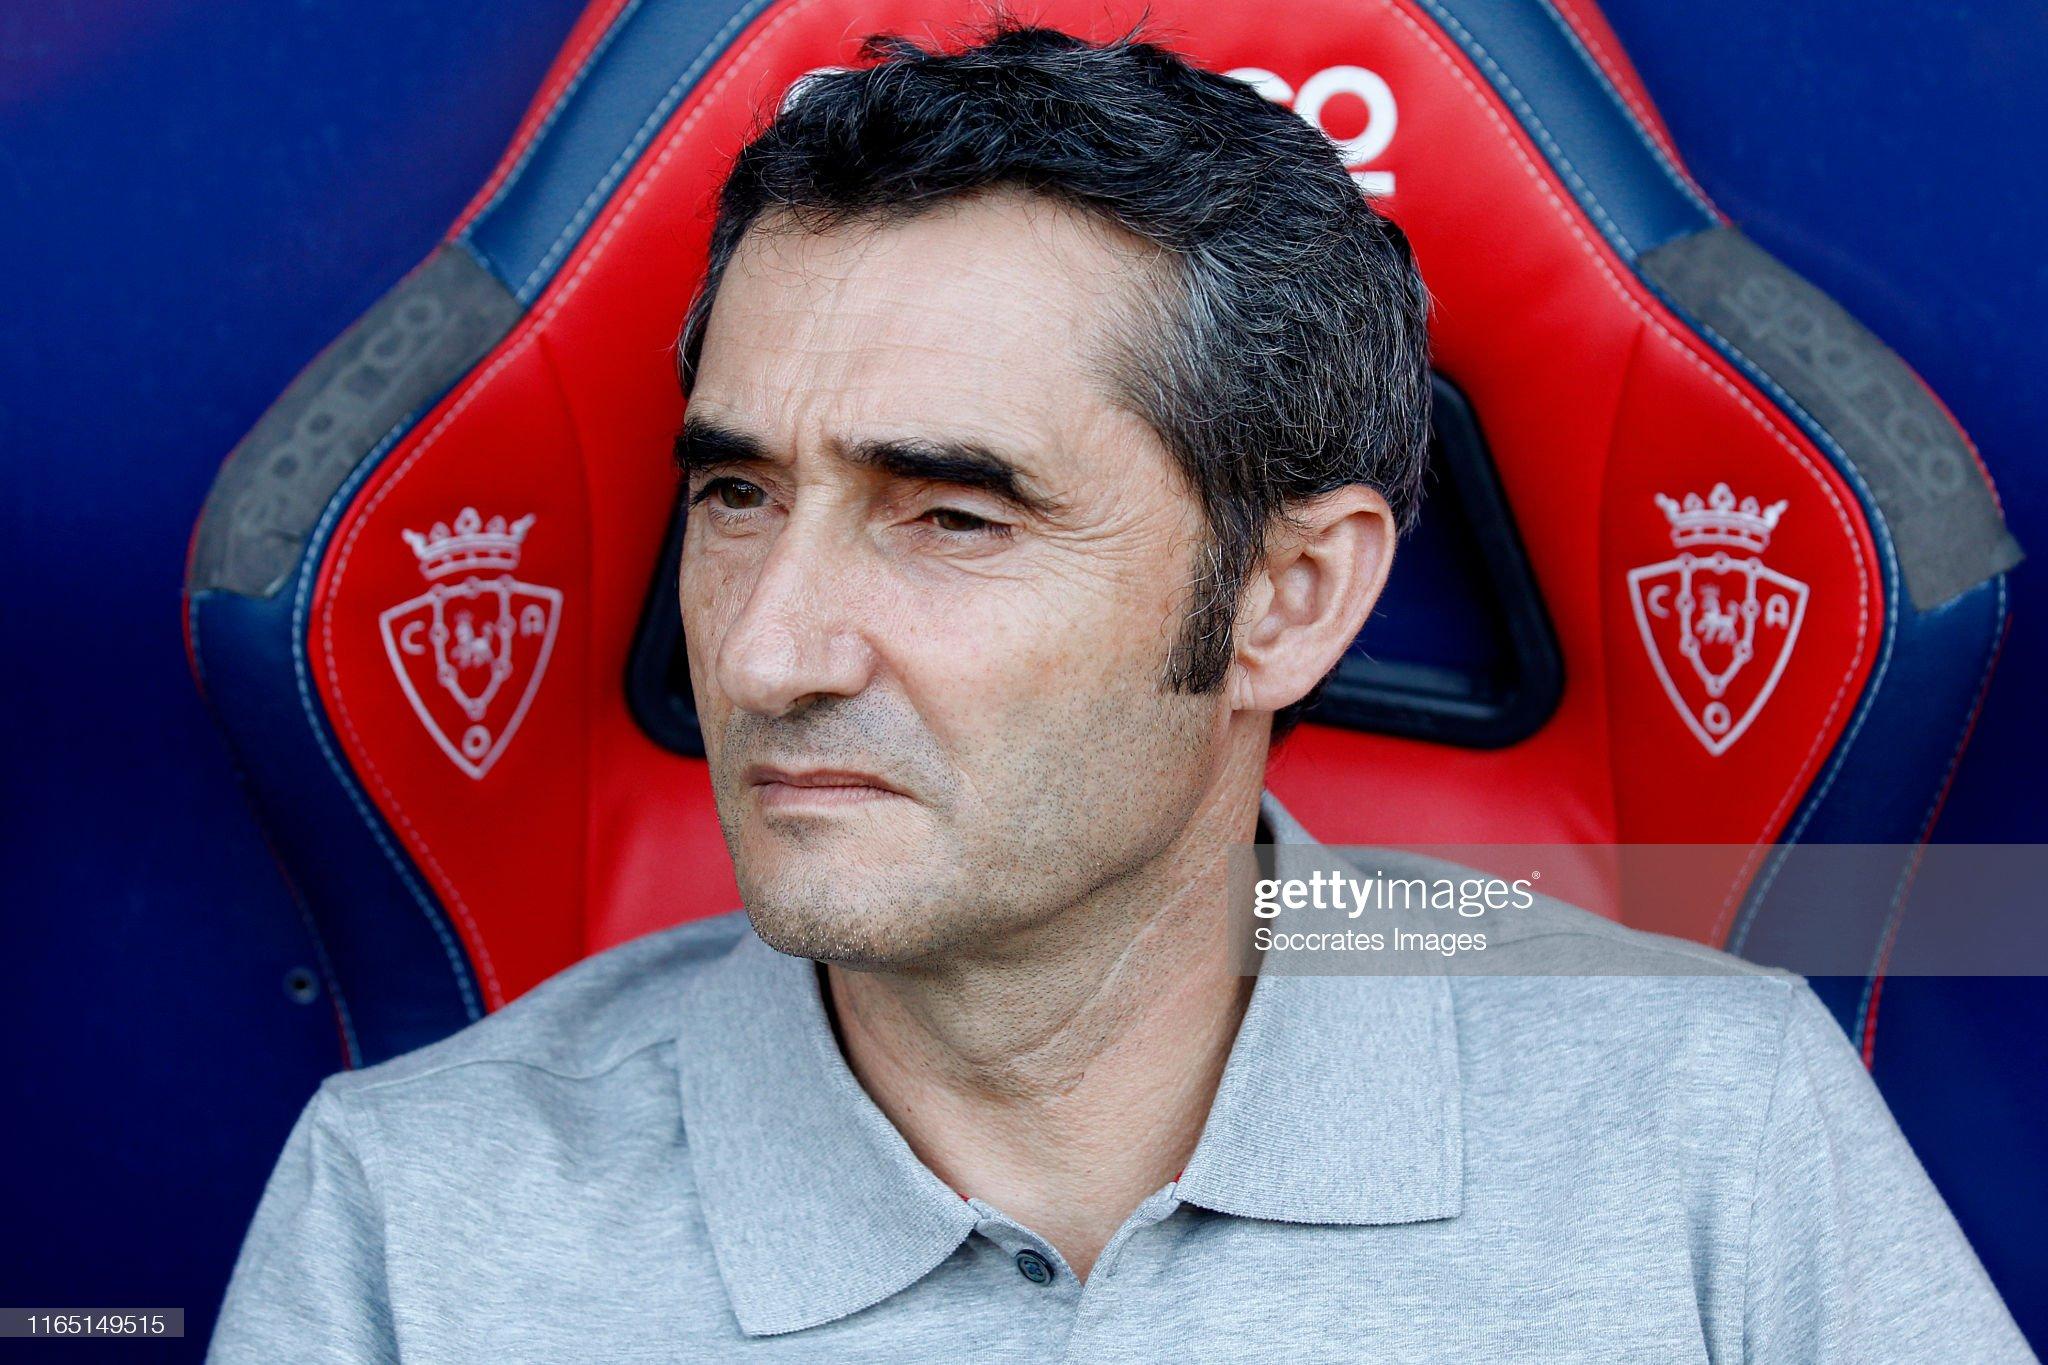 صور مباراة : أوساسونا - برشلونة 2-2 ( 31-08-2019 )  Coach-ernesto-valverde-of-fc-barcelona-during-the-la-liga-santander-picture-id1165149515?s=2048x2048